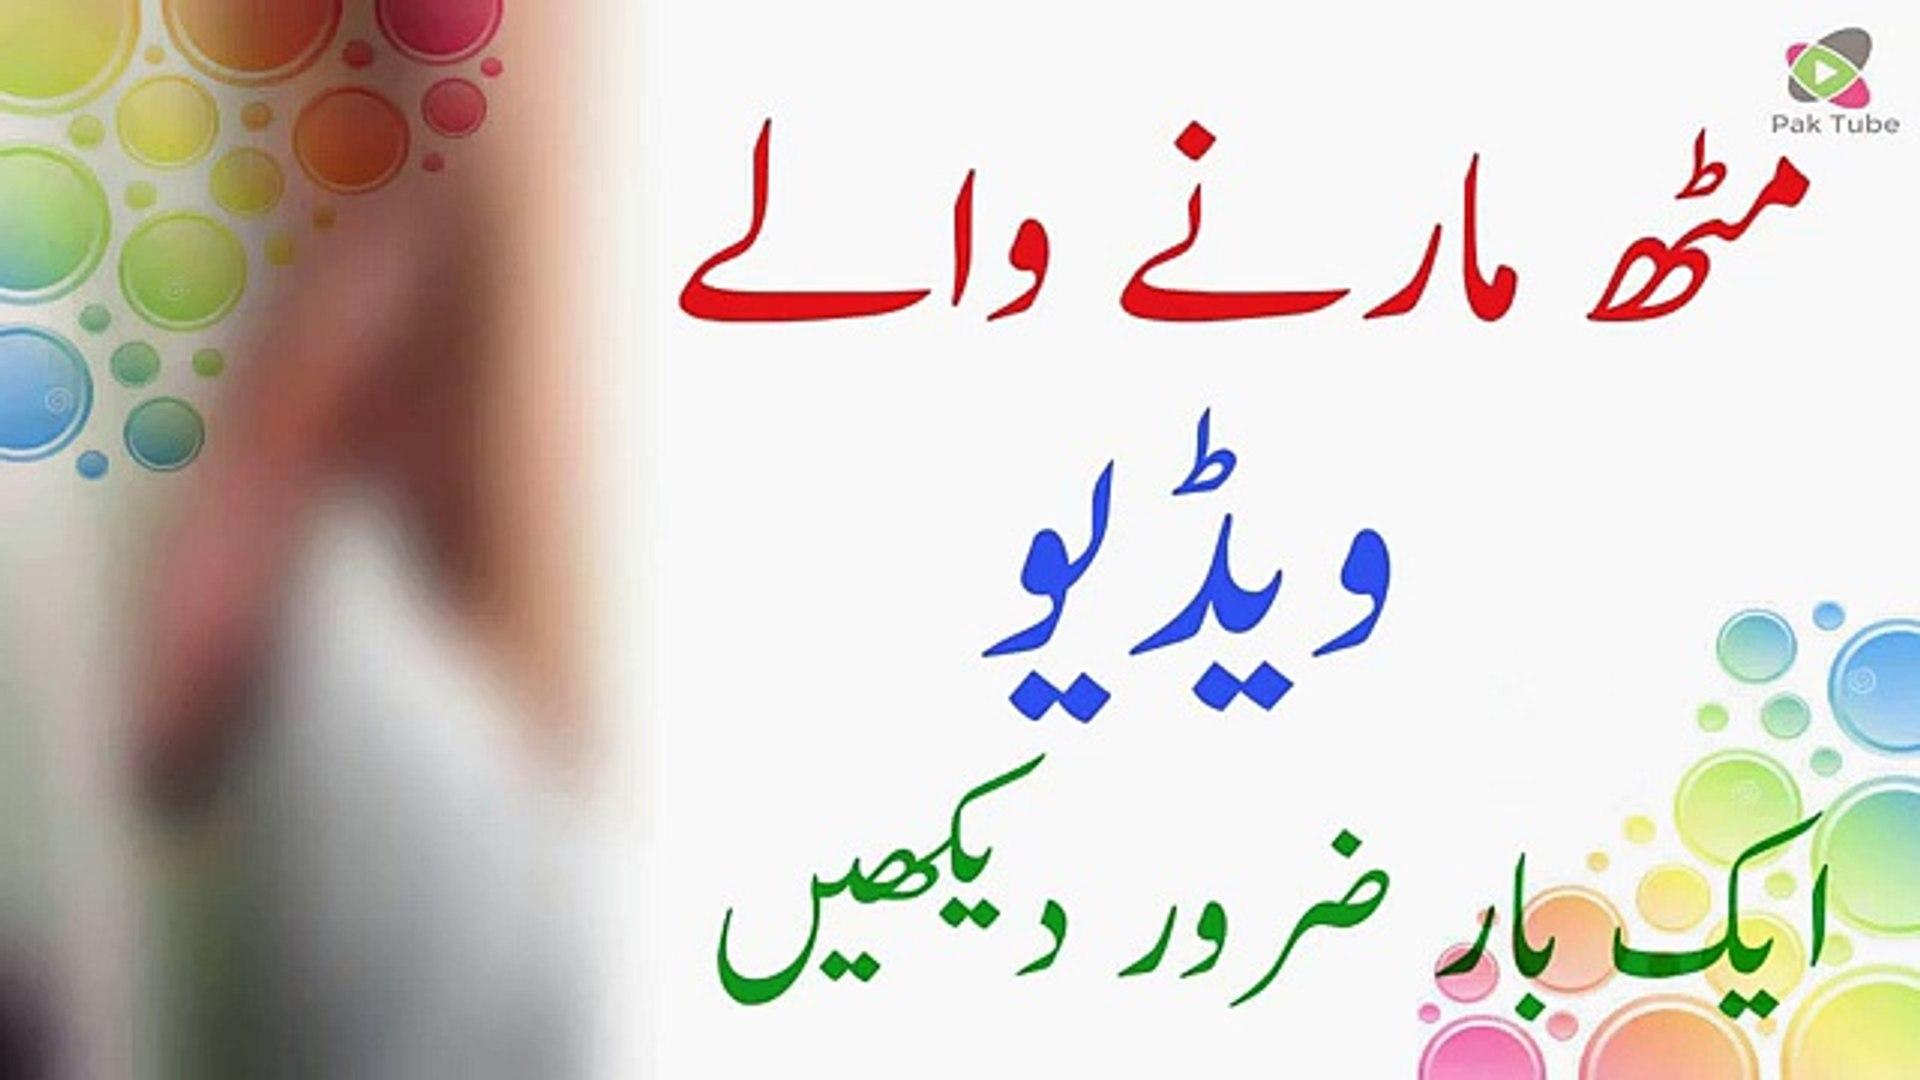 Muth Marny Waly Ya Video Ak Bar Zaror Dakien